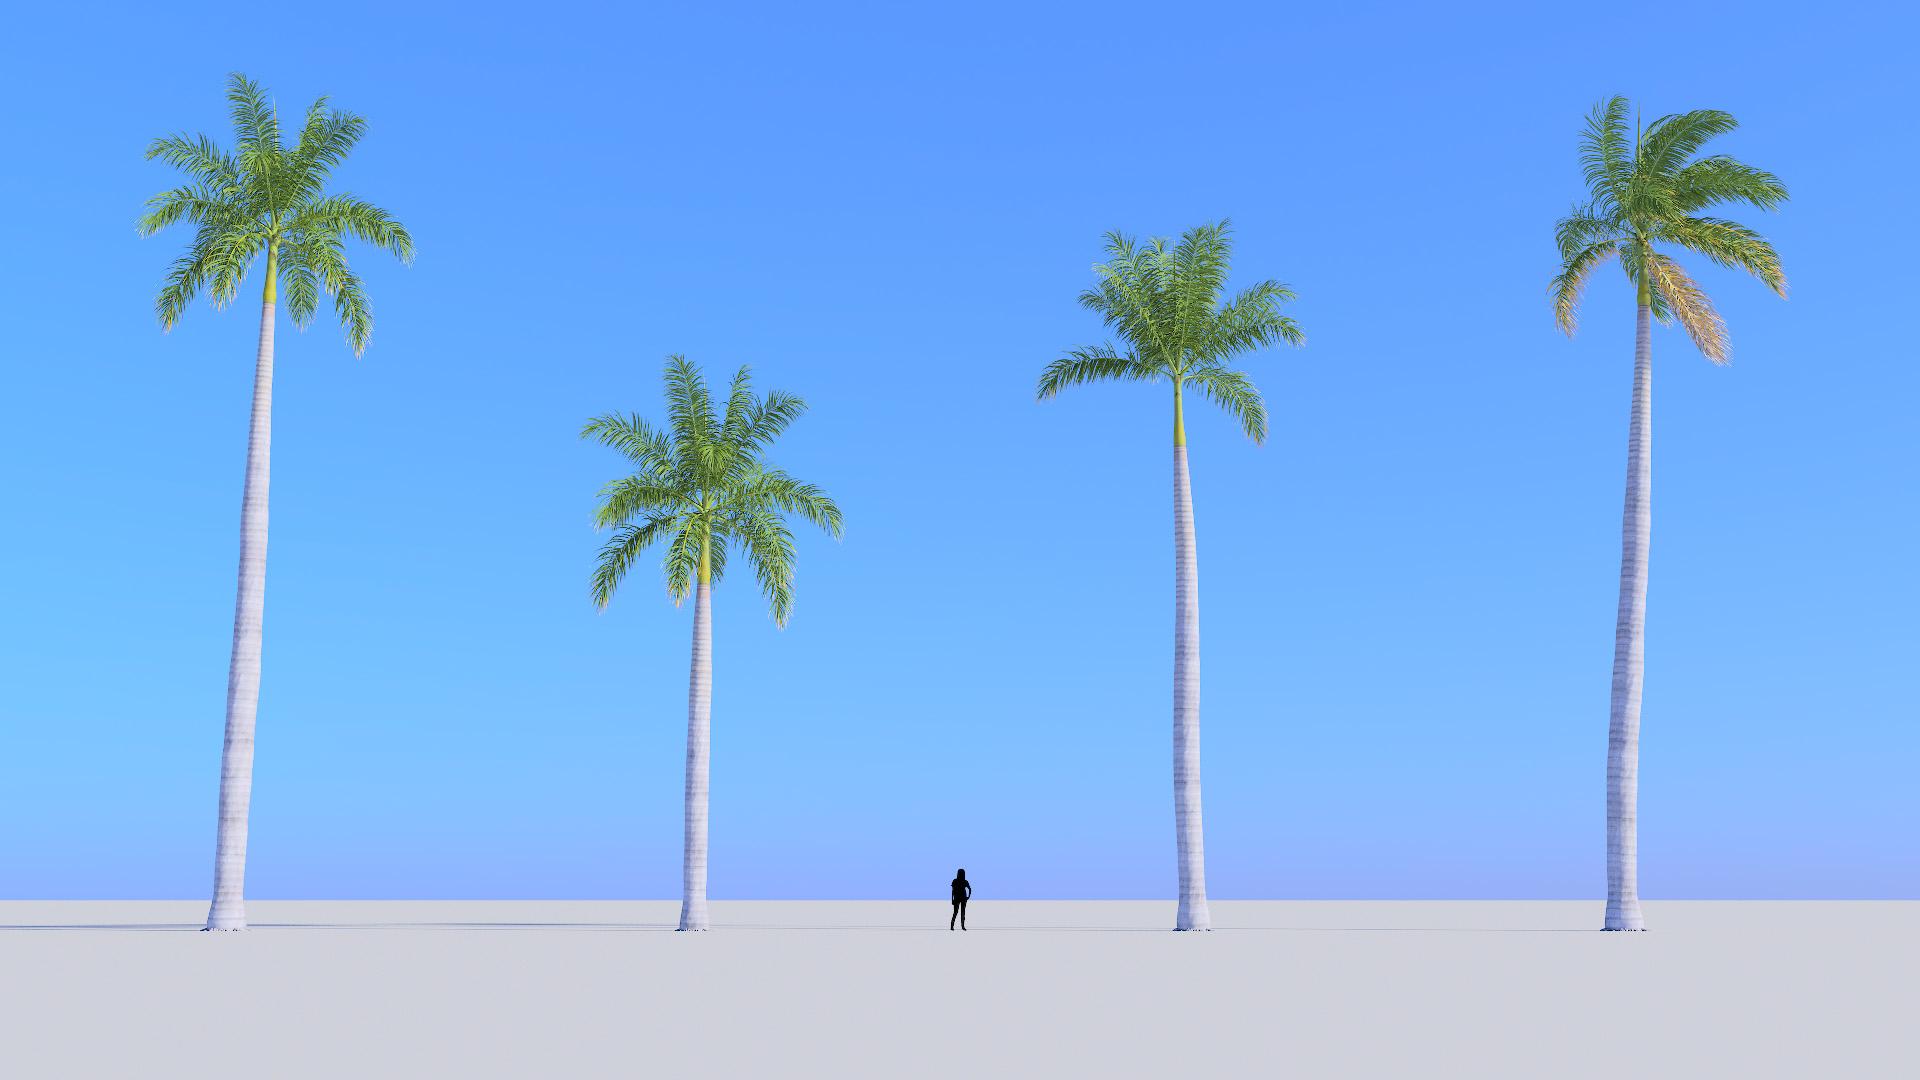 3D model of the Royal palm Roystonea regia